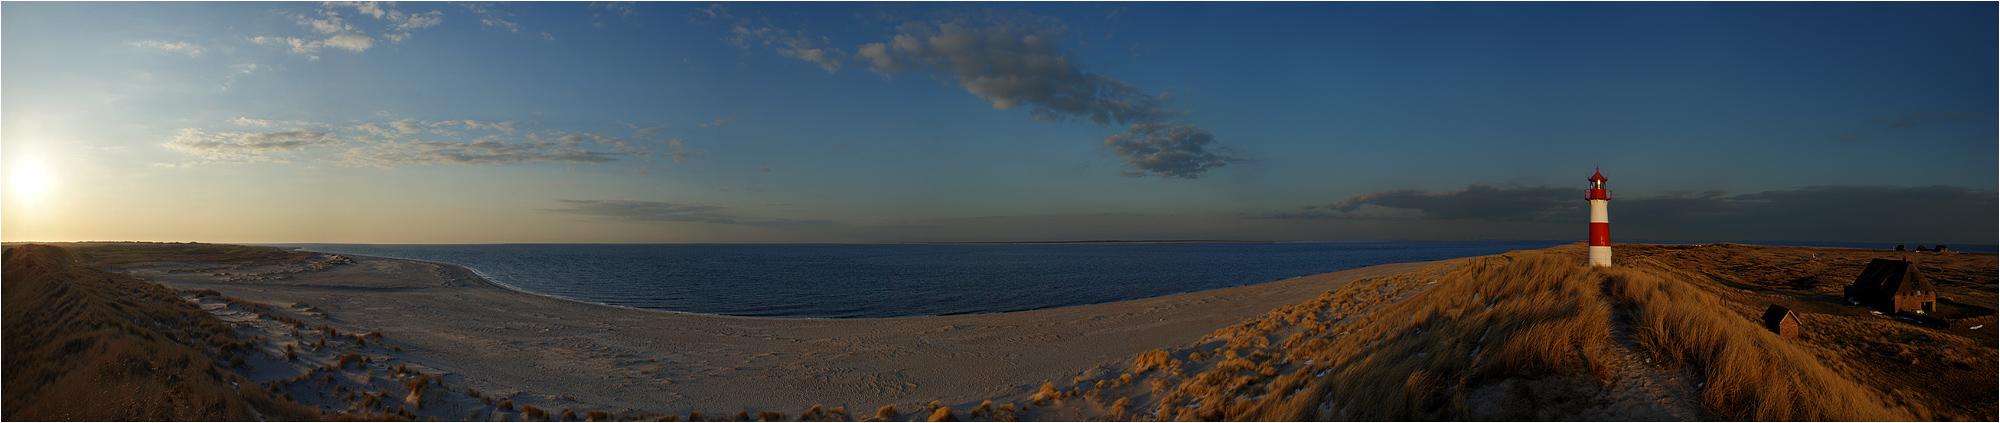 Sylt Panorama